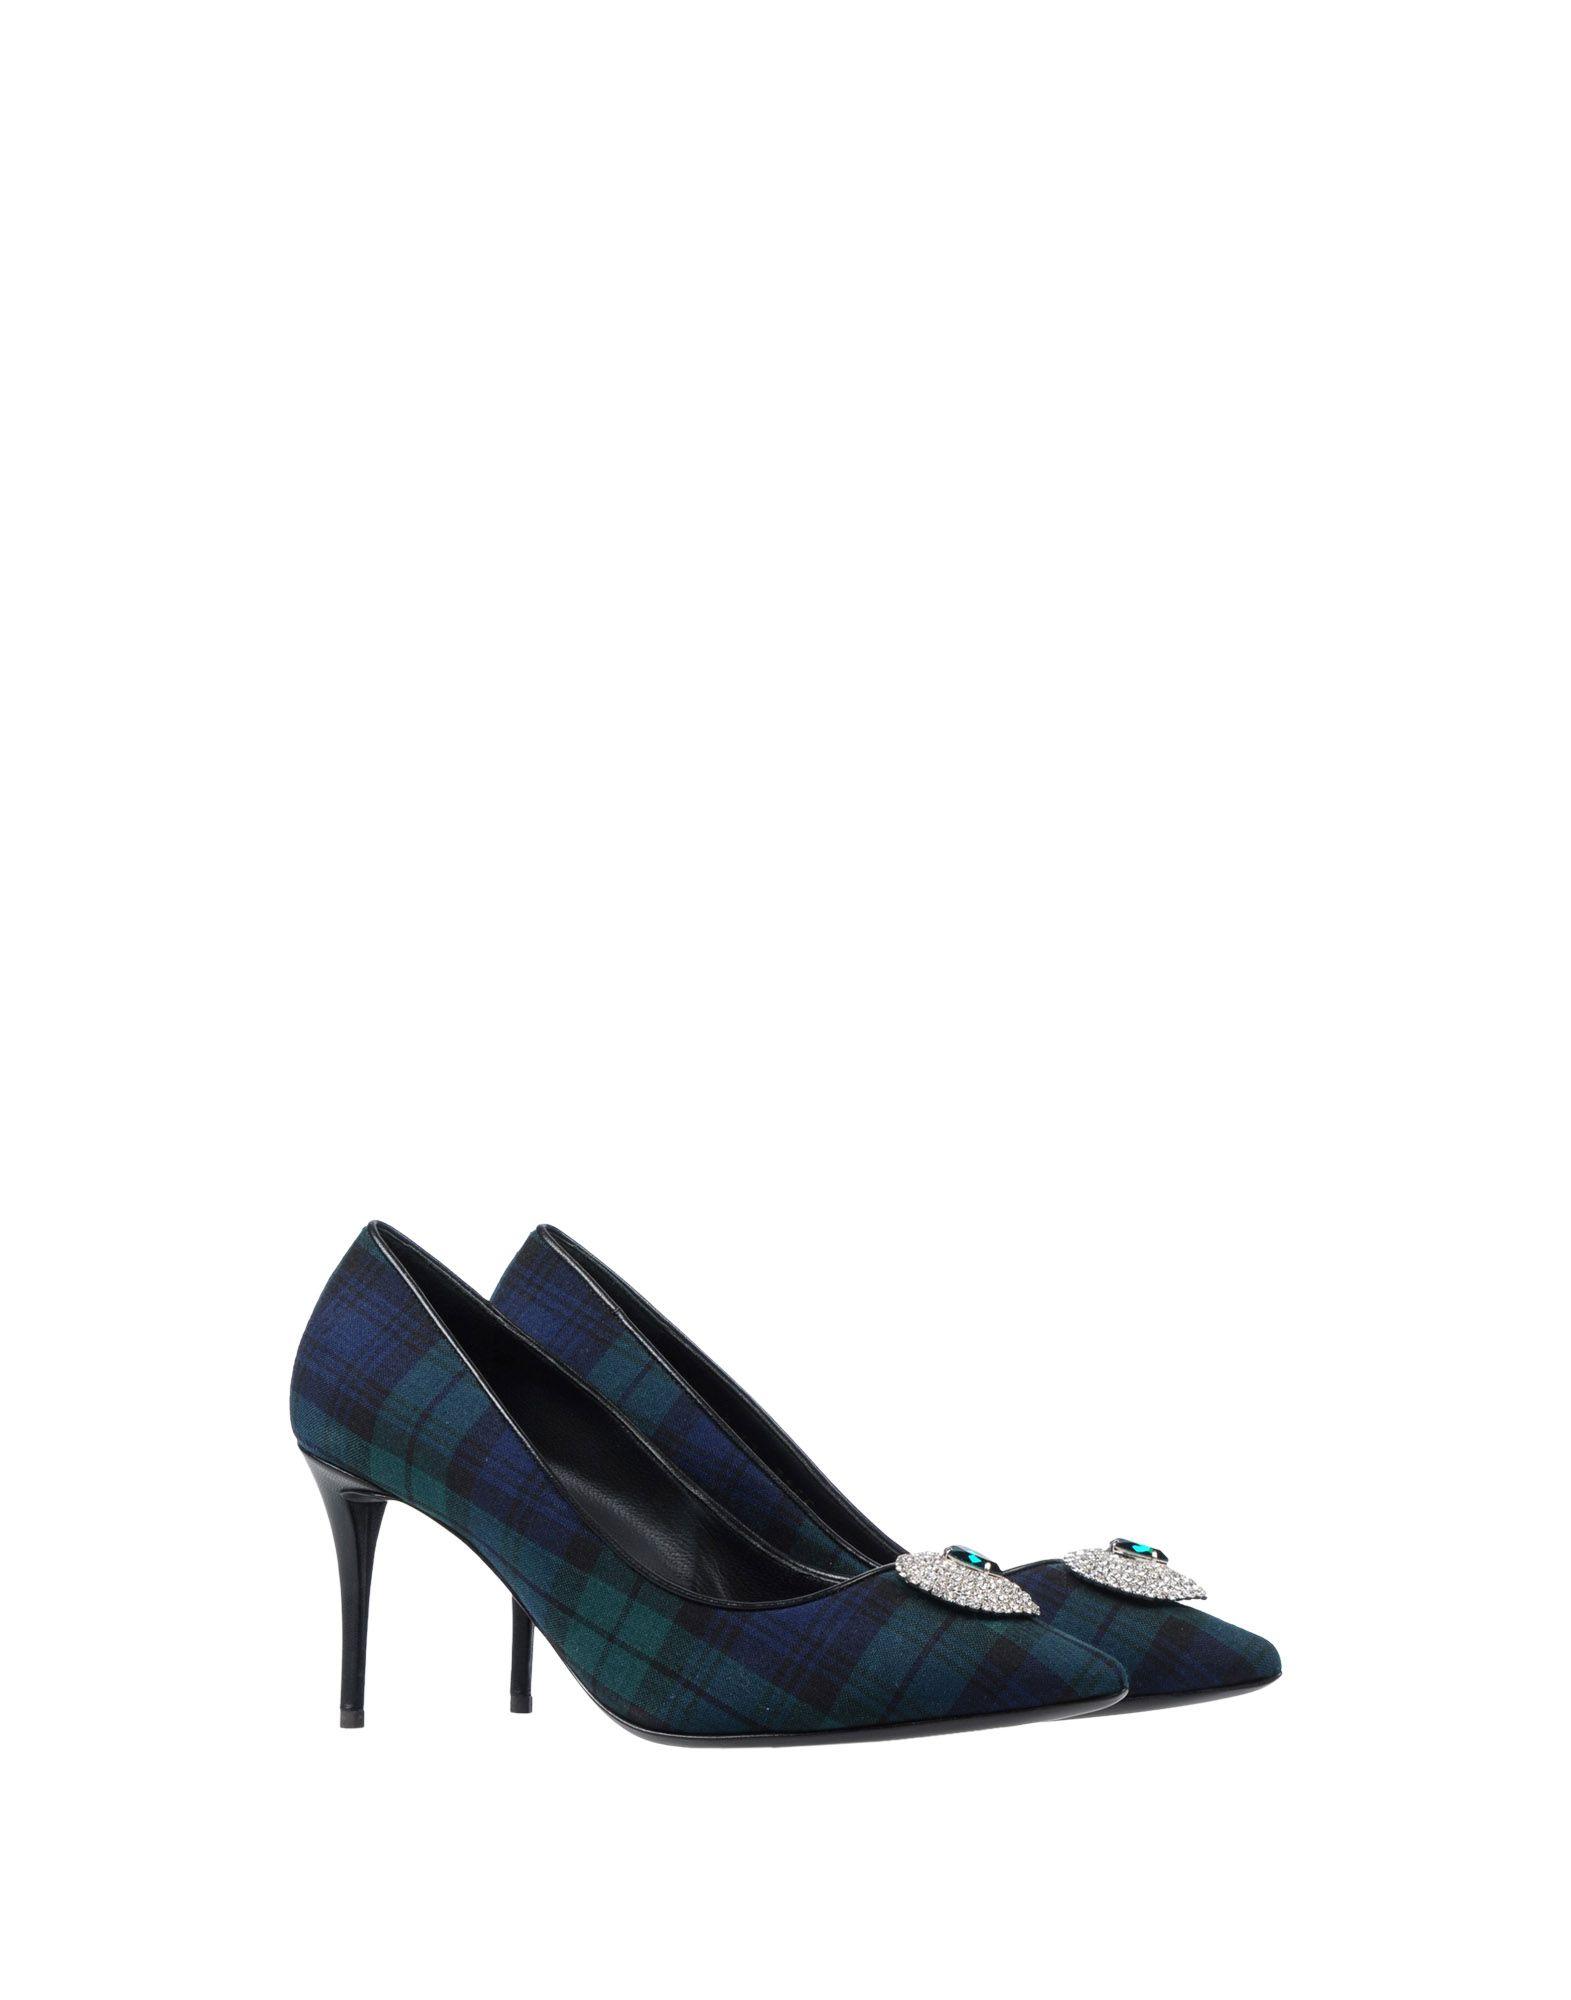 Rabatt Schuhe Giuseppe Zanotti Pumps 11505633AK Damen  11505633AK Pumps 637f4f